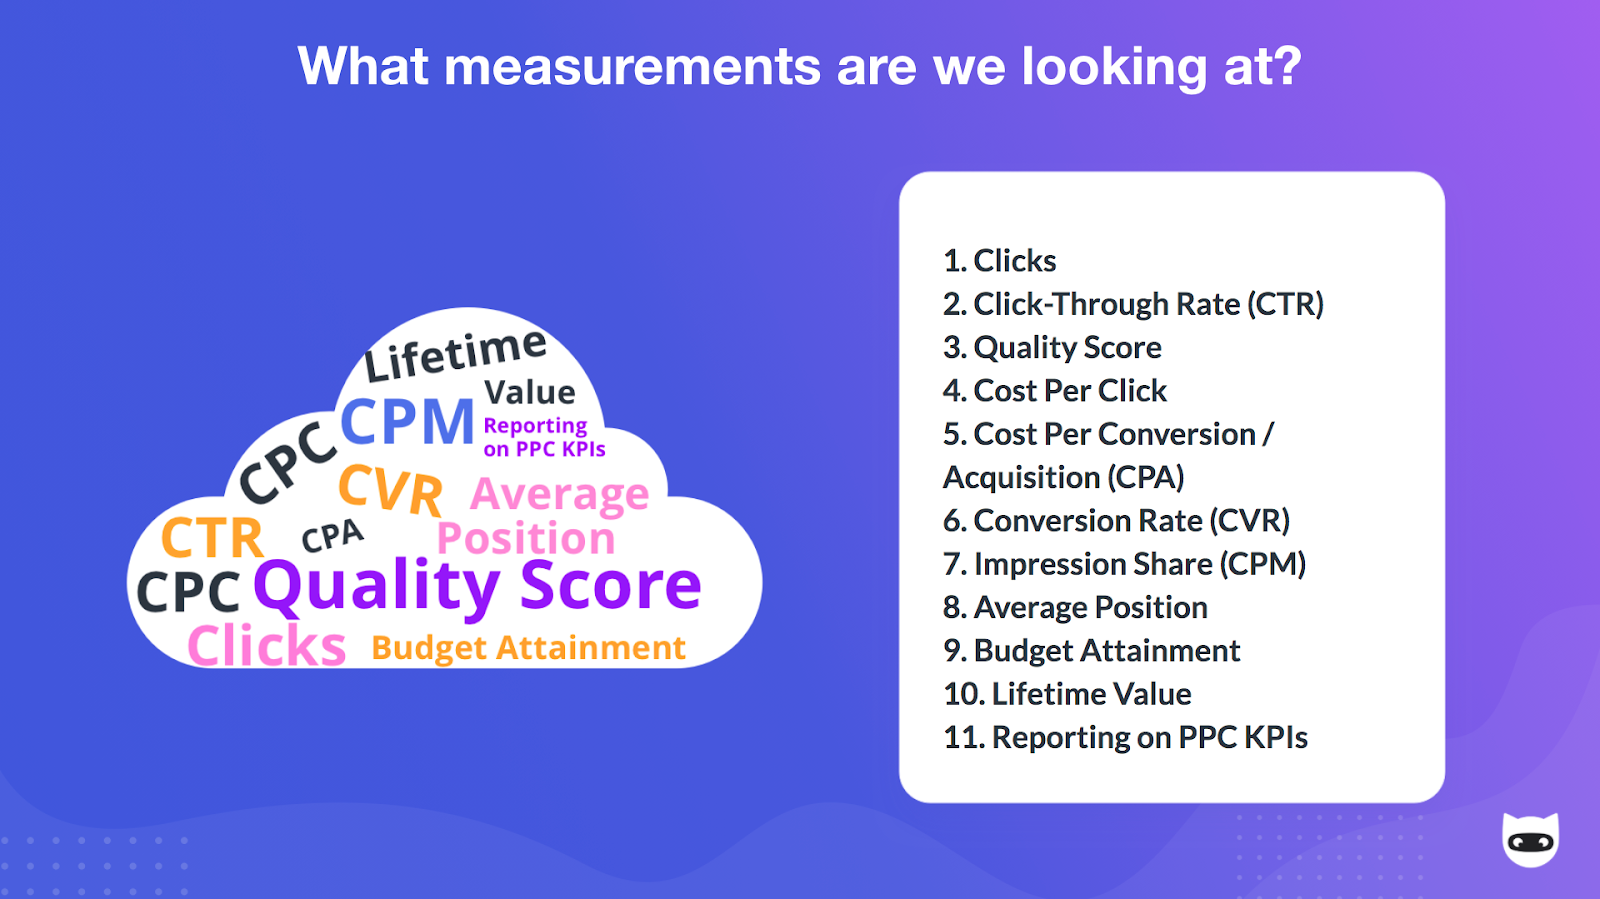 Common Digital Marketing Performance Metrics by NinjaCat